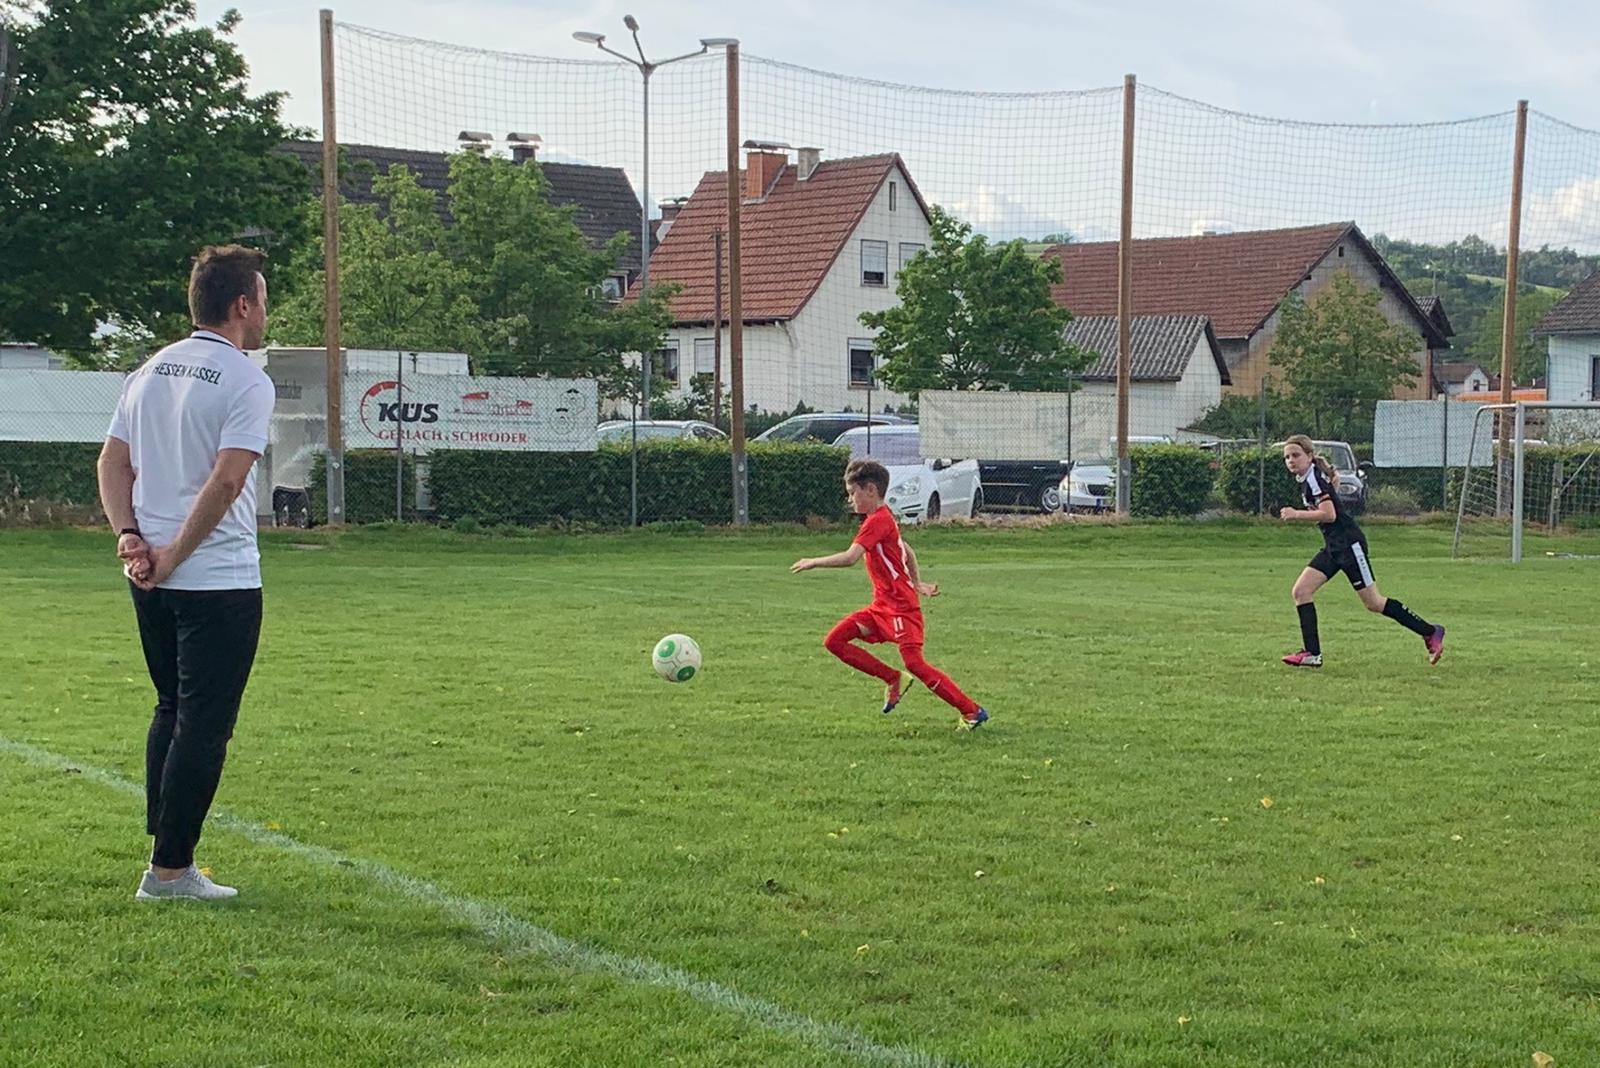 JSG Rotenburg / Lispenhausen U11 - U10